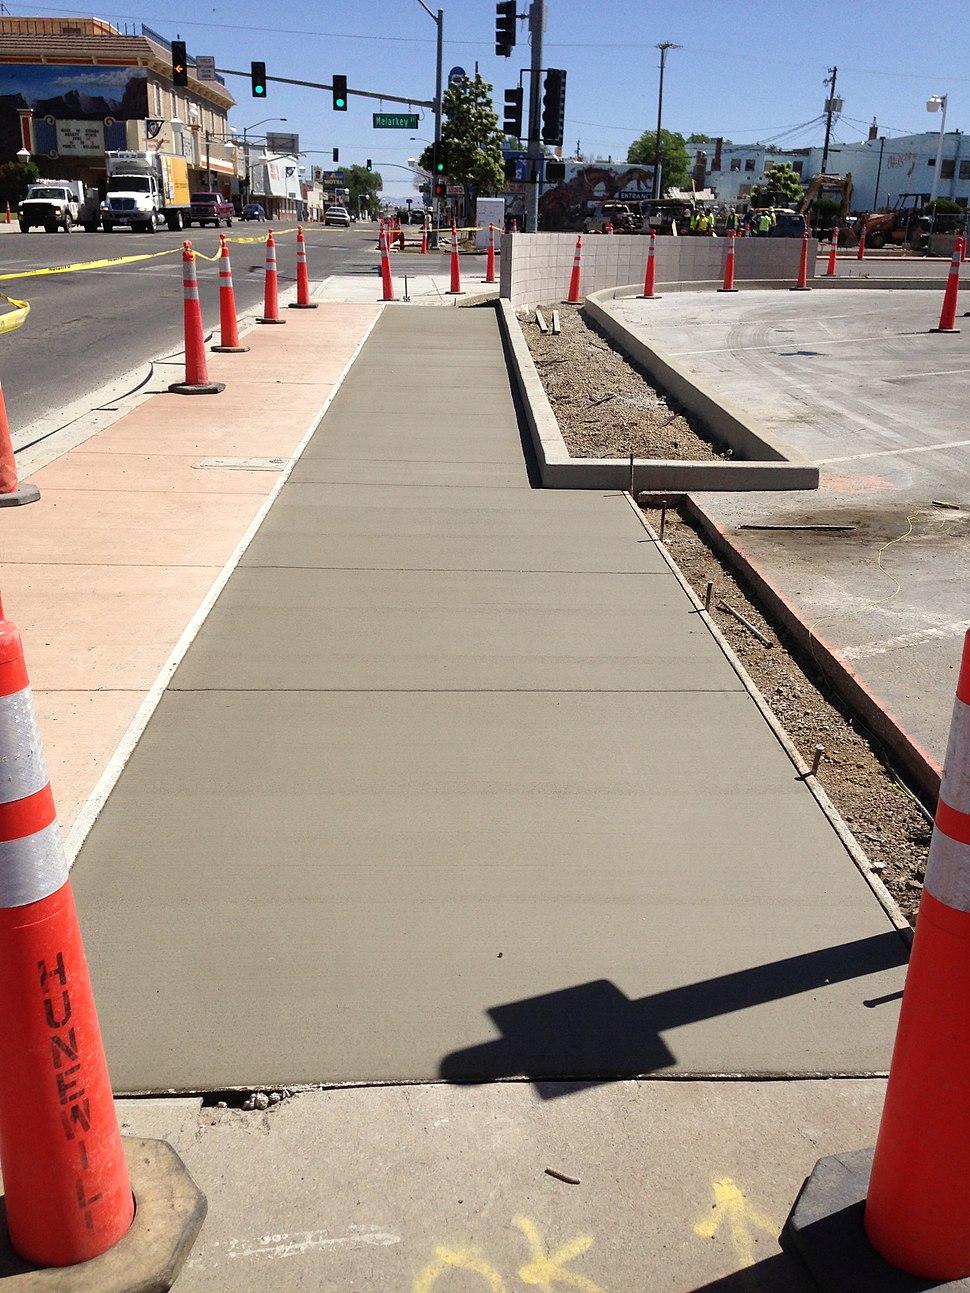 2014-06-12 10 38 10 Fresh sidewalk along U.S. Route 95 (West Winnemucca Boulevard) near Melarkey Street and Nevada State Route 289 (Winnemucca Boulevard) in Winnemucca, Nevada